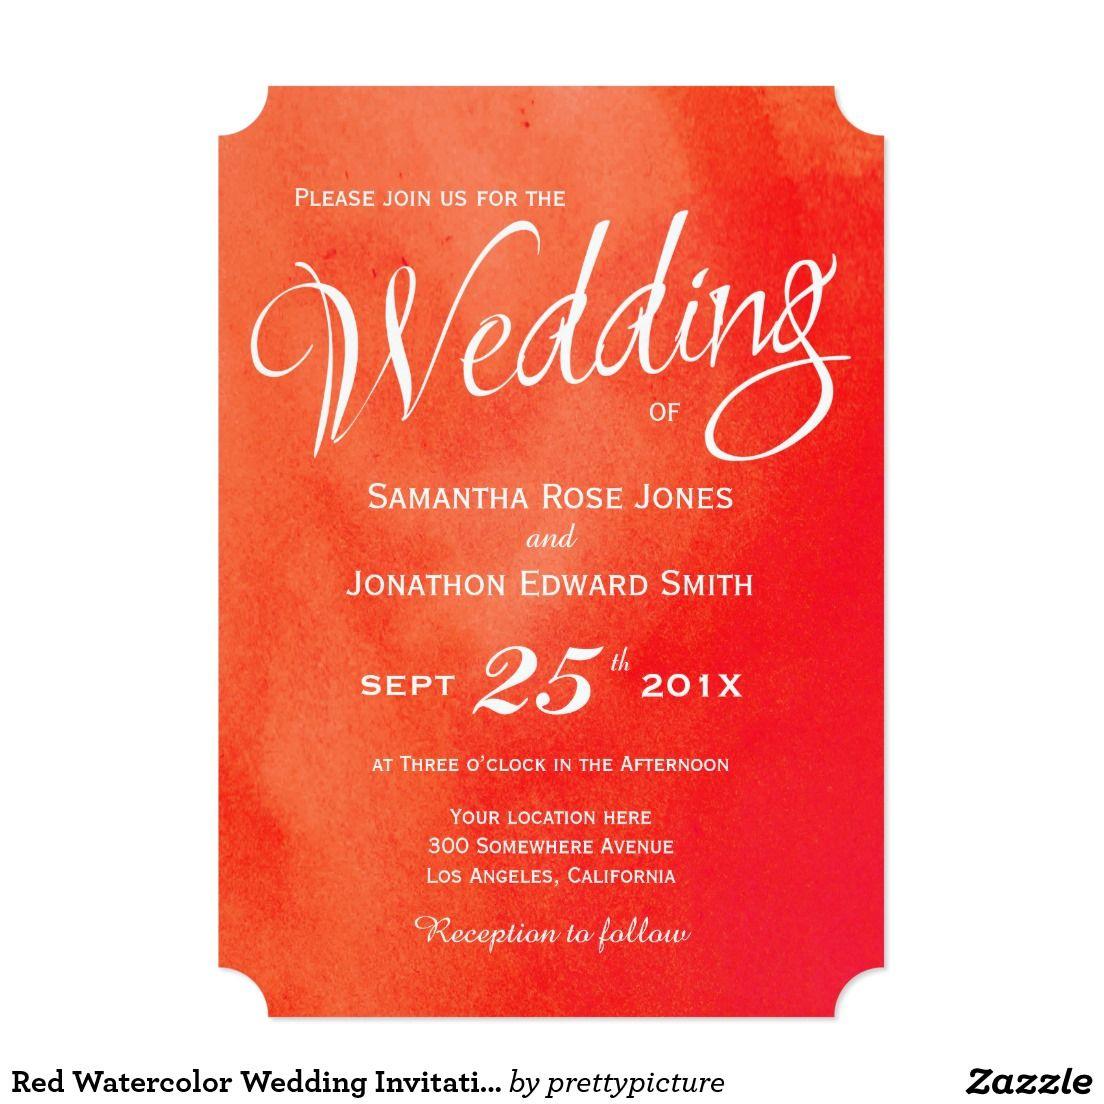 Red Watercolor Wedding Invitation | Perfect Weddings | Pinterest ...